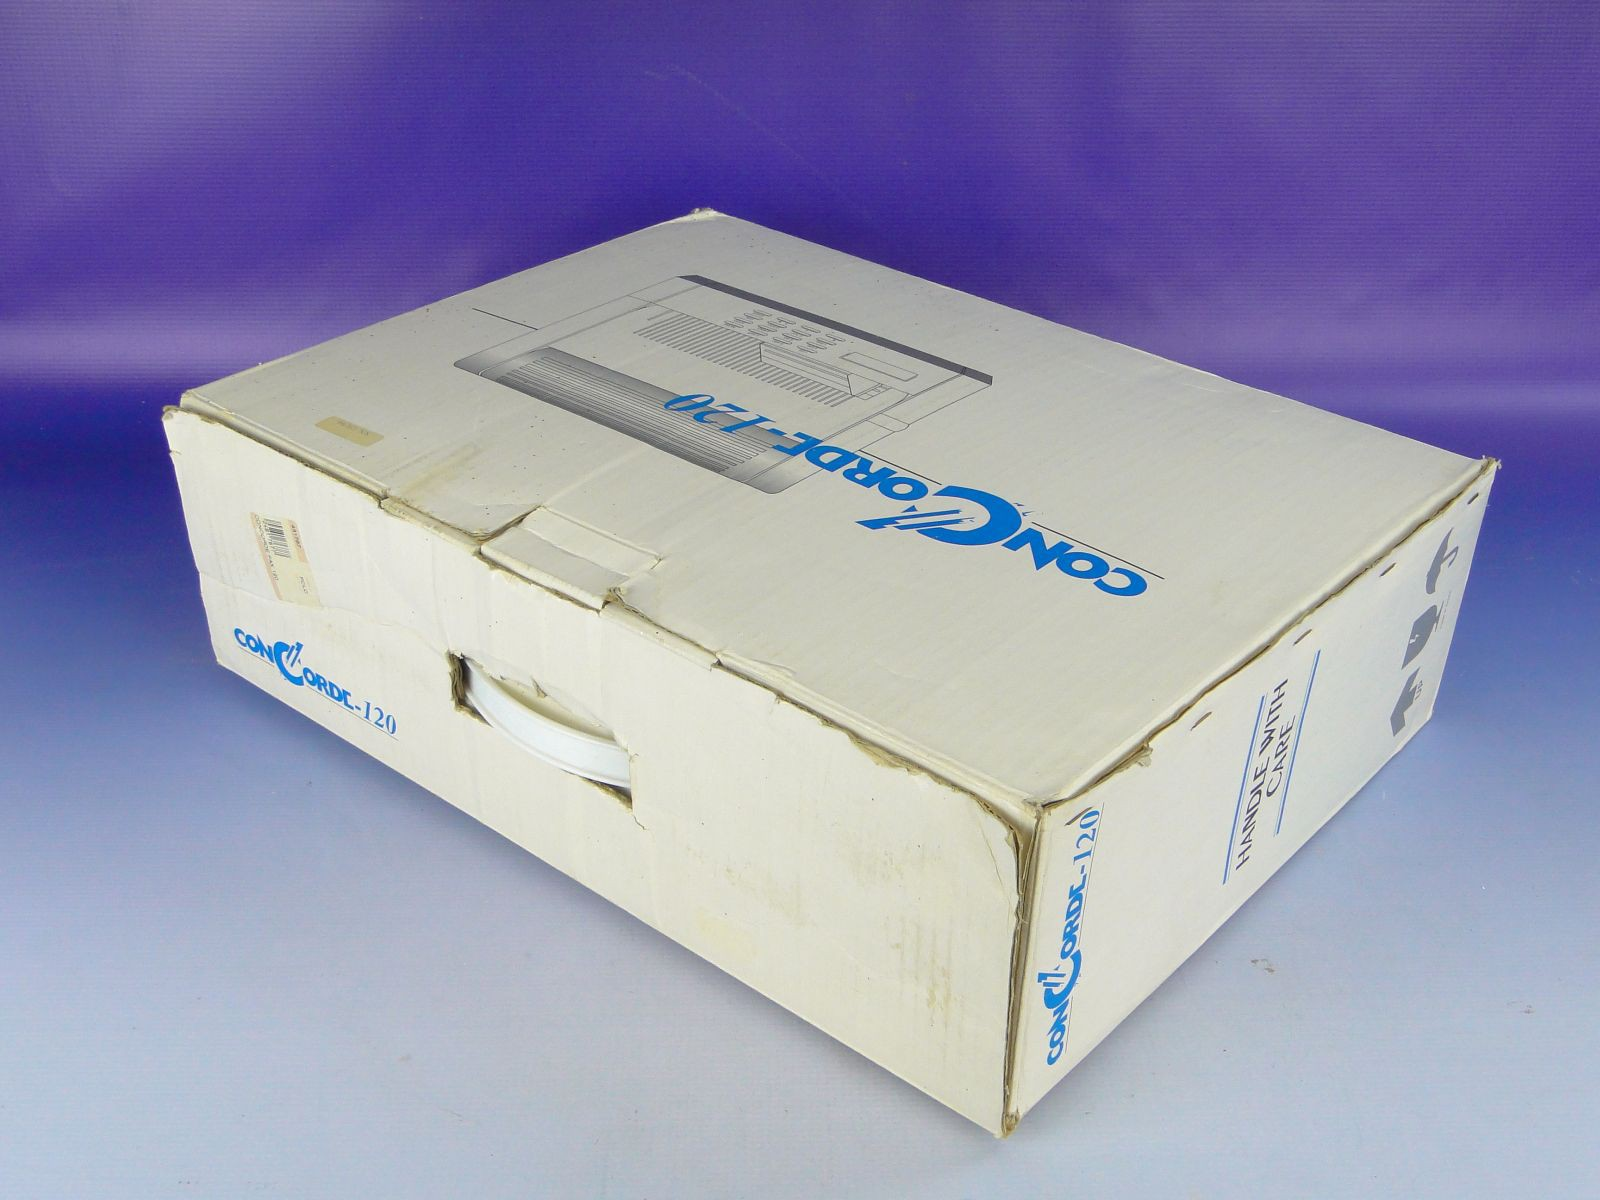 DSC09917.JPG (1600×1200)